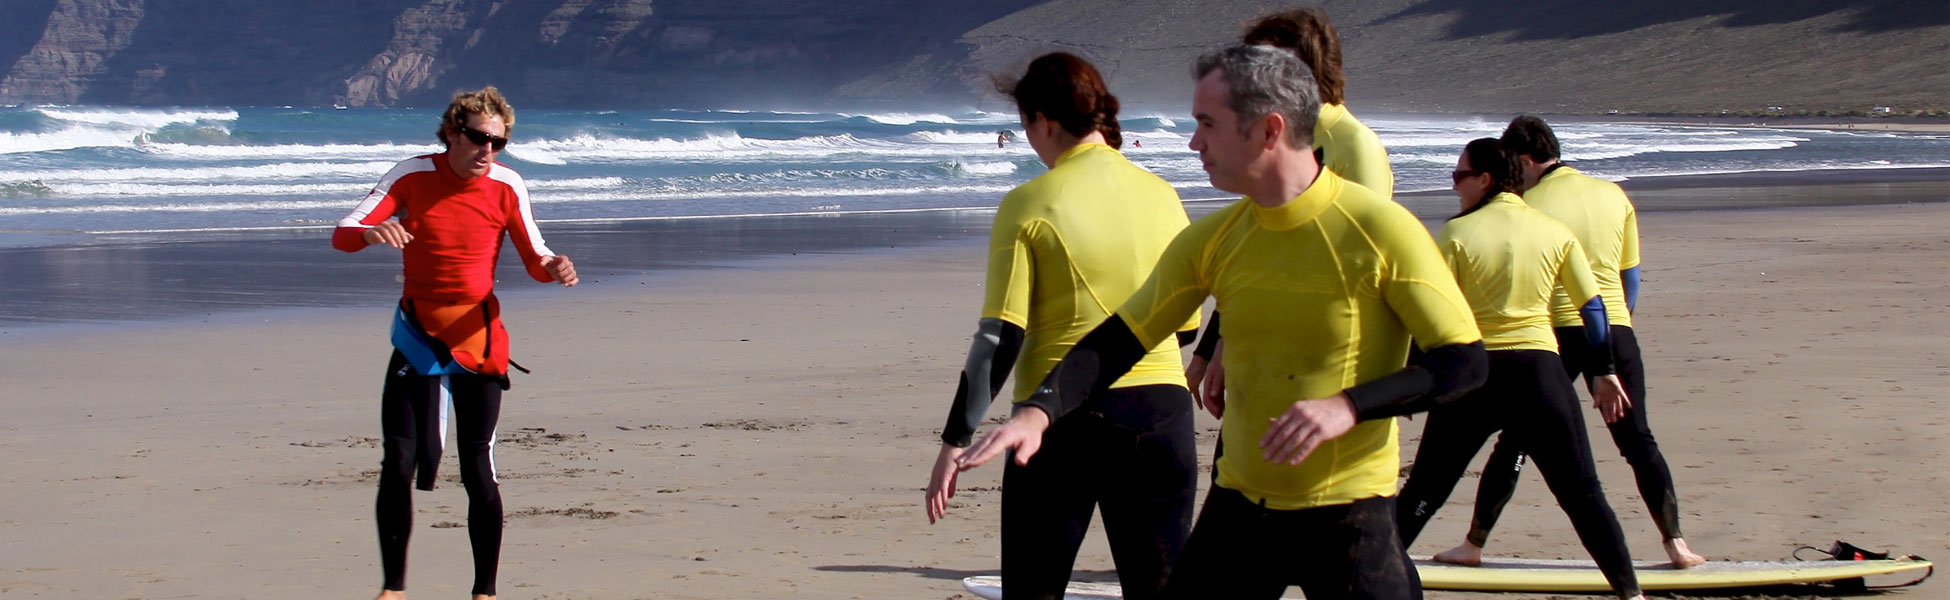 teaching surfing on famara beach